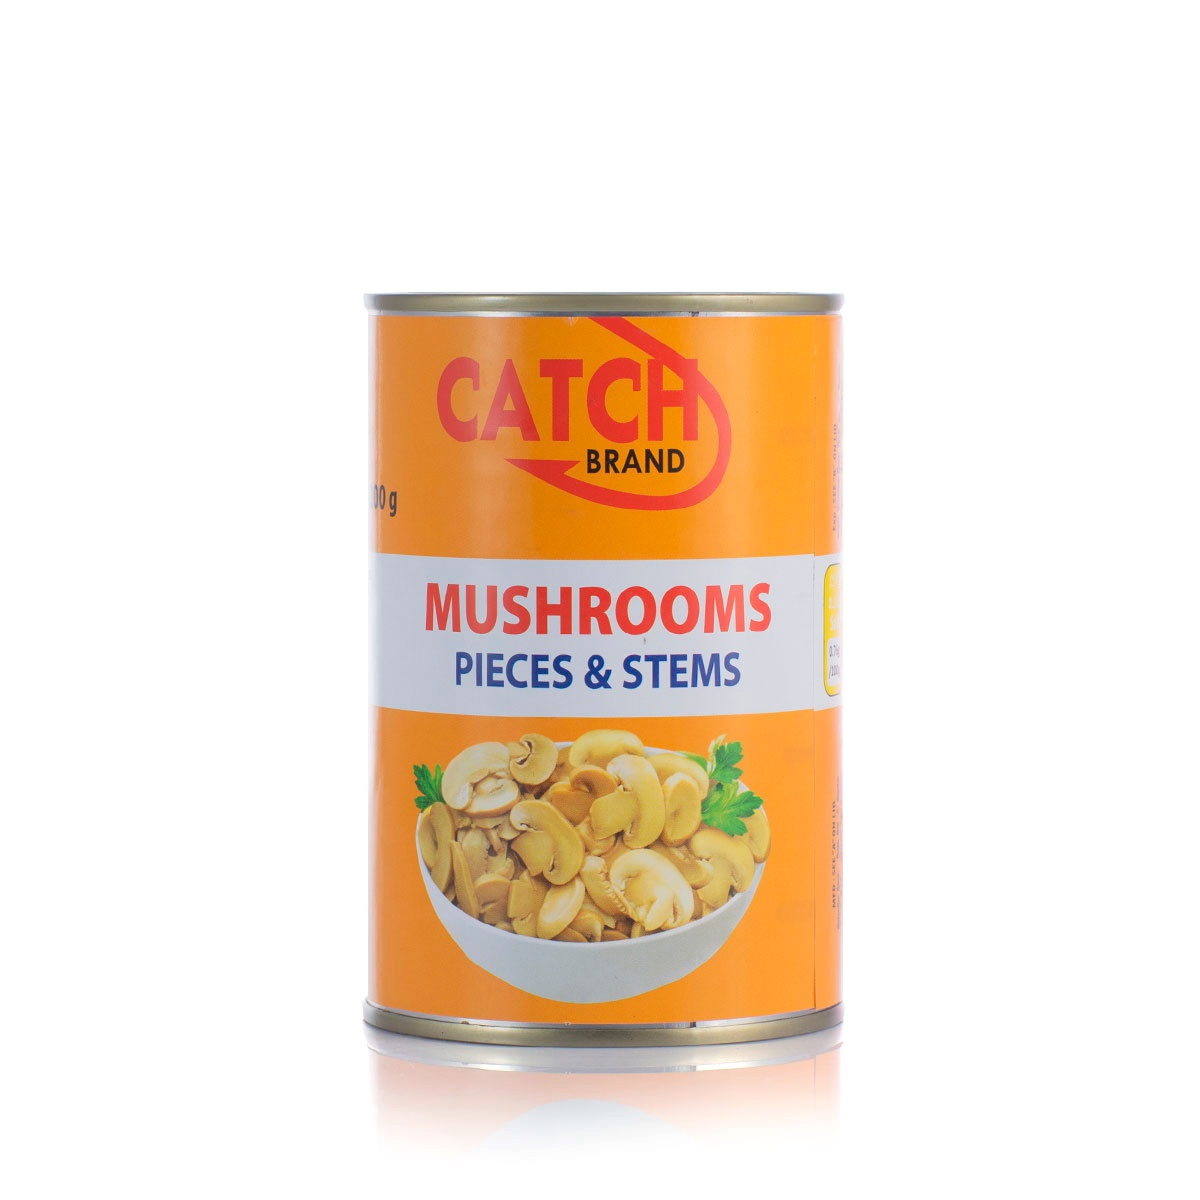 Catch Mushrooms Pieces & Stems 400g - in Sri Lanka